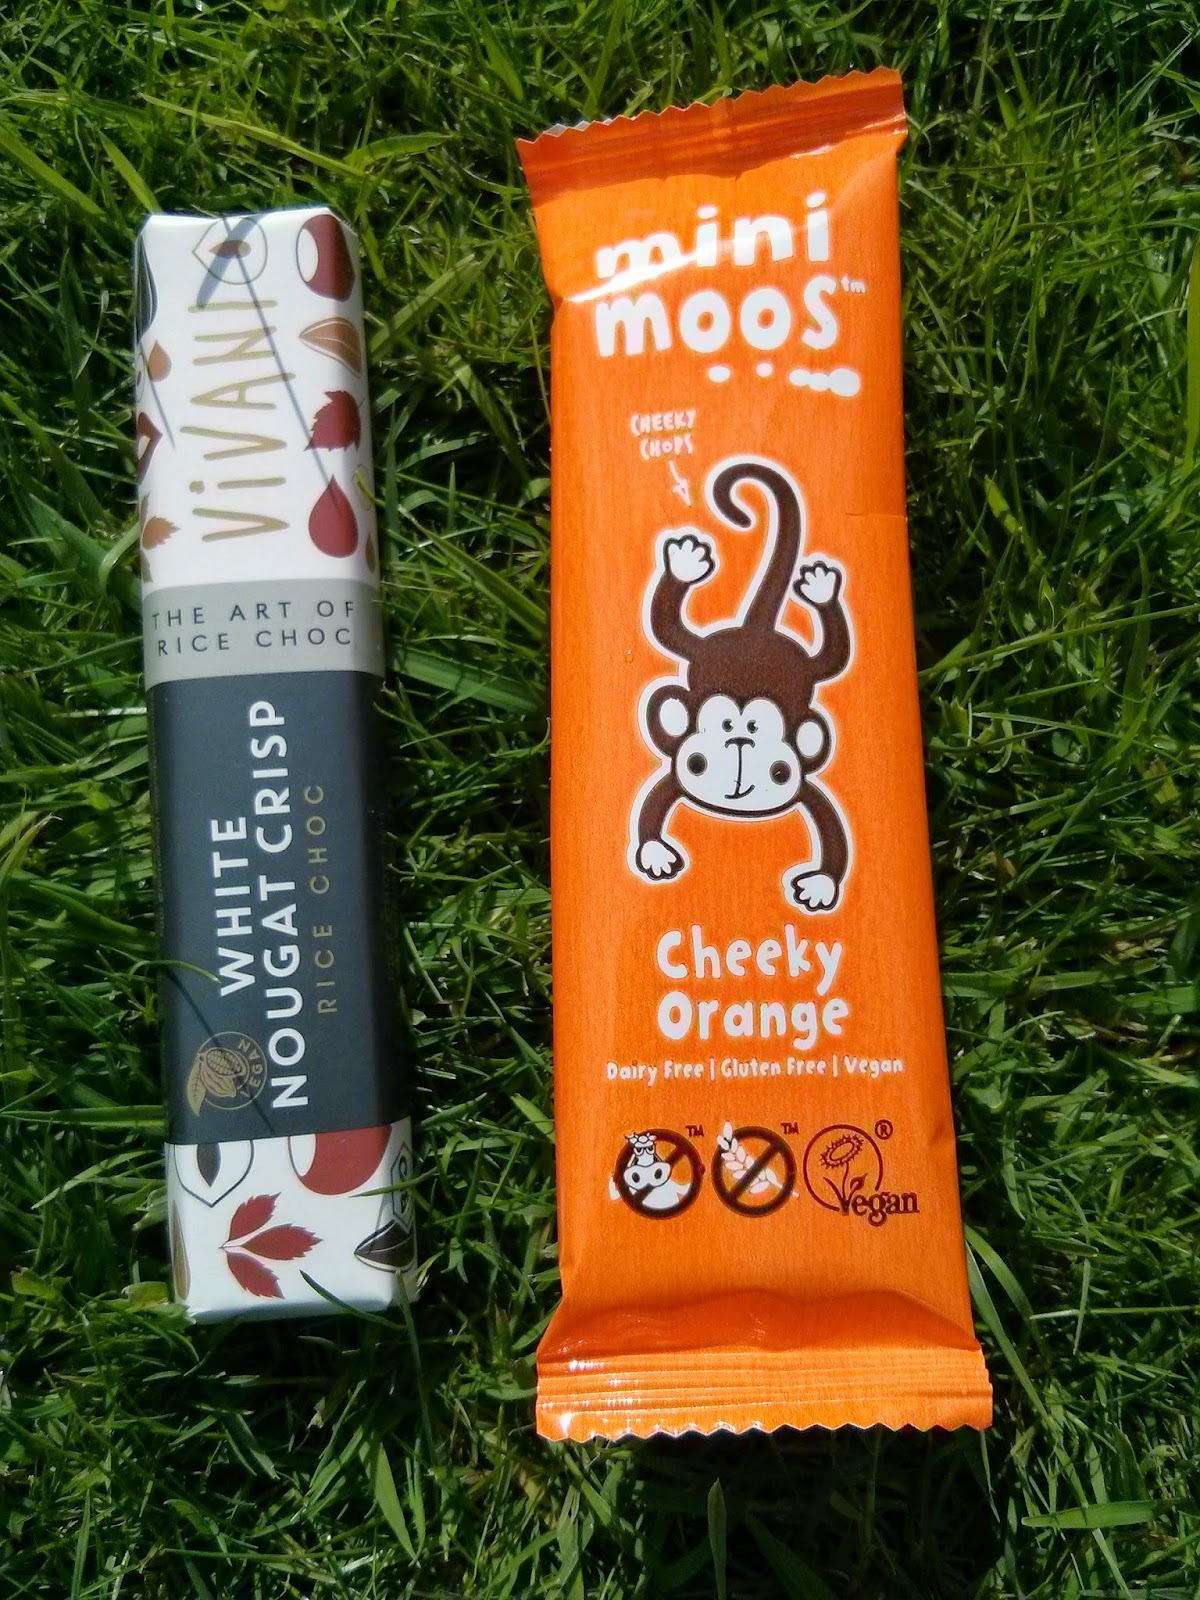 Vegan Tuck Box, Chocolate, Mini Moos